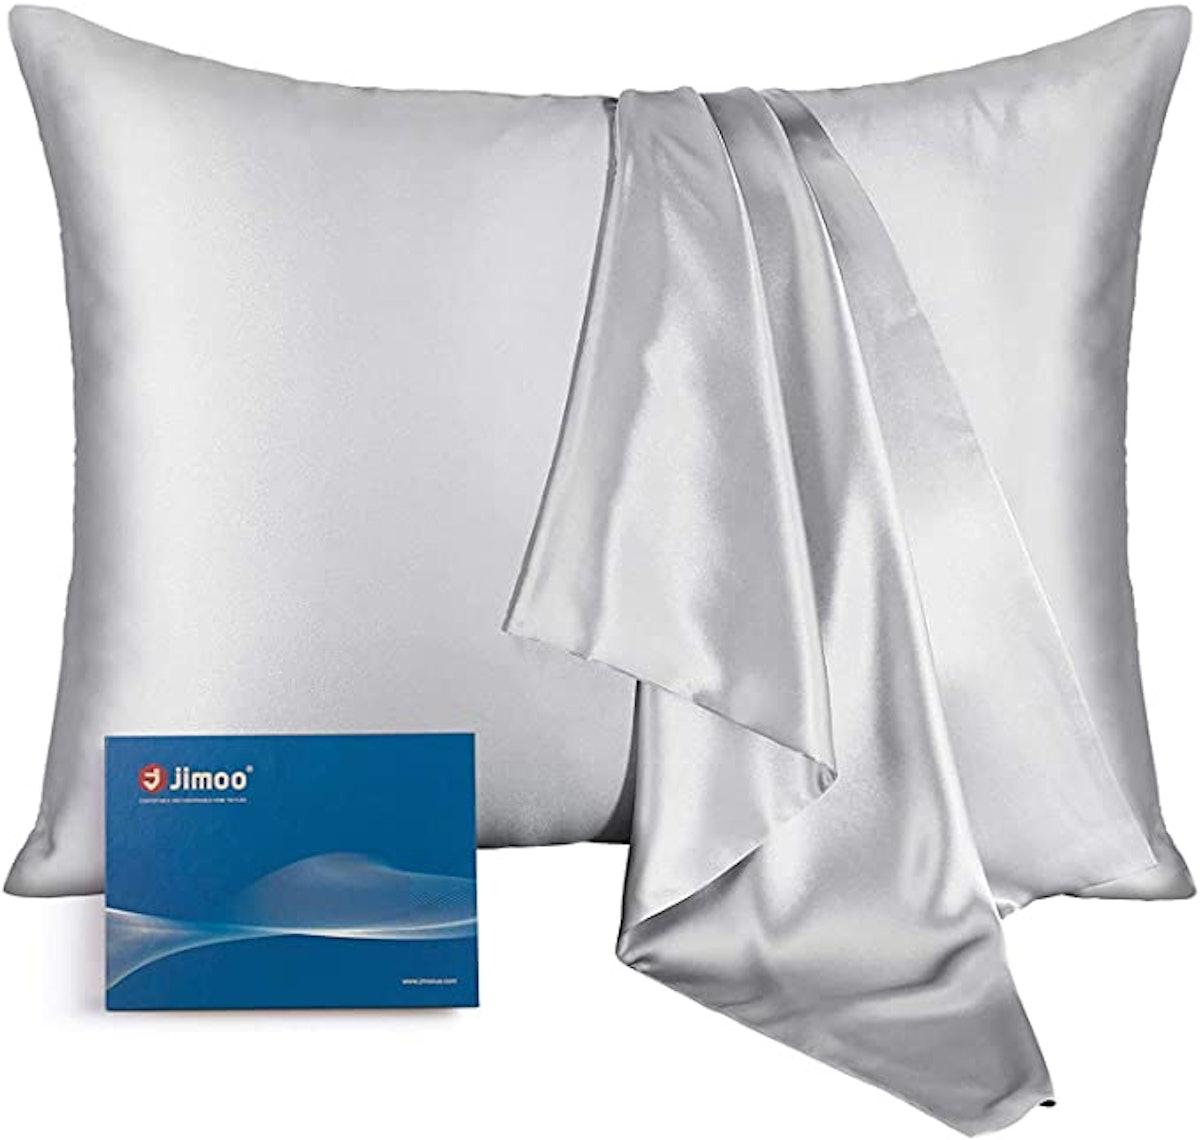 J JIMOO Natural Silk Pillowcase